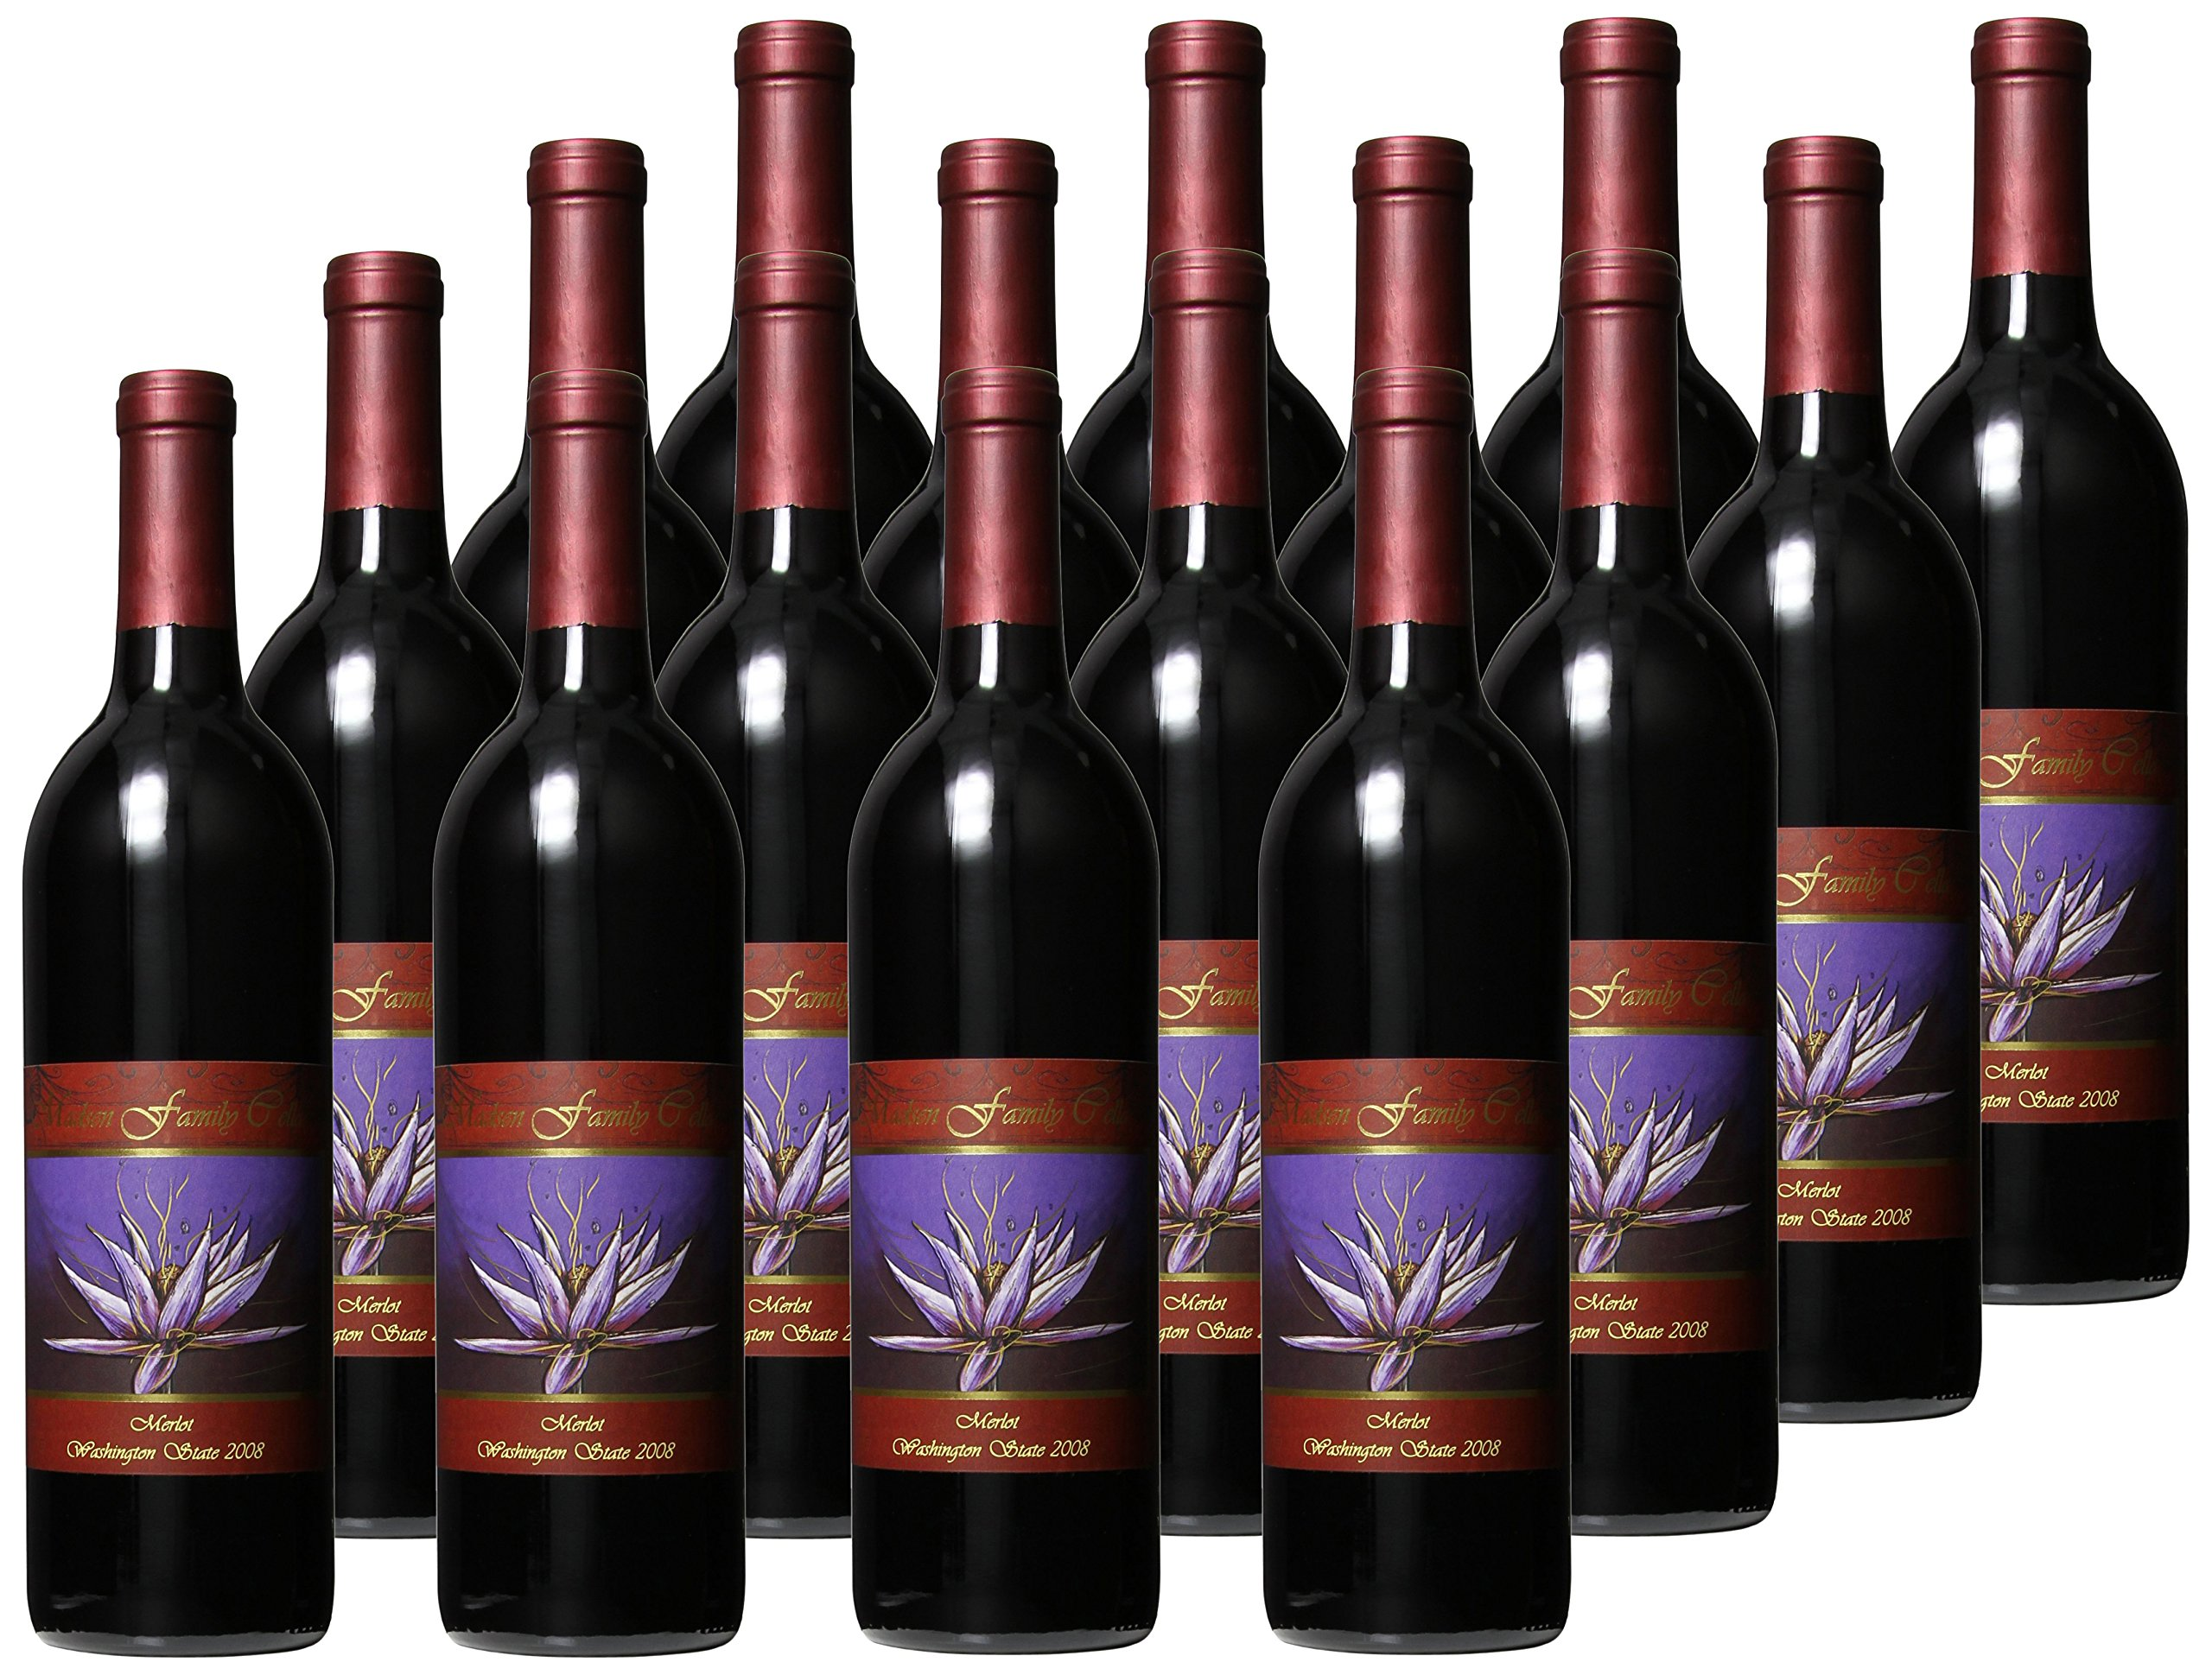 2009 Madsen Family Cellars Washington State Merlot Case Pack, 12 x 750 mL Wine